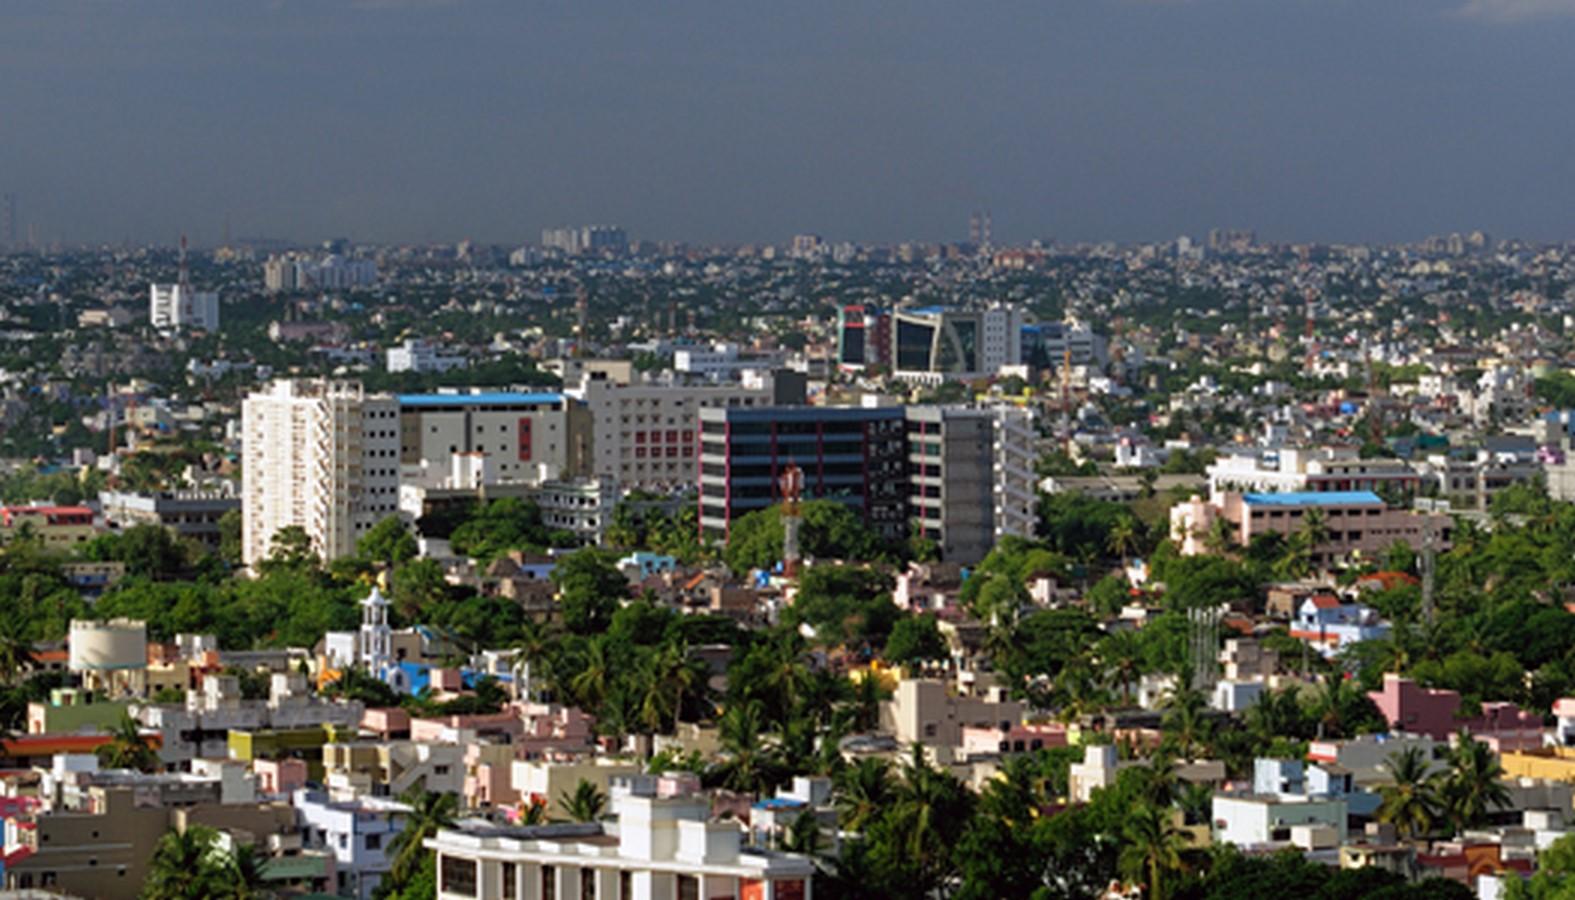 Rethinking the urbanscapes of Chennai - Sheet2